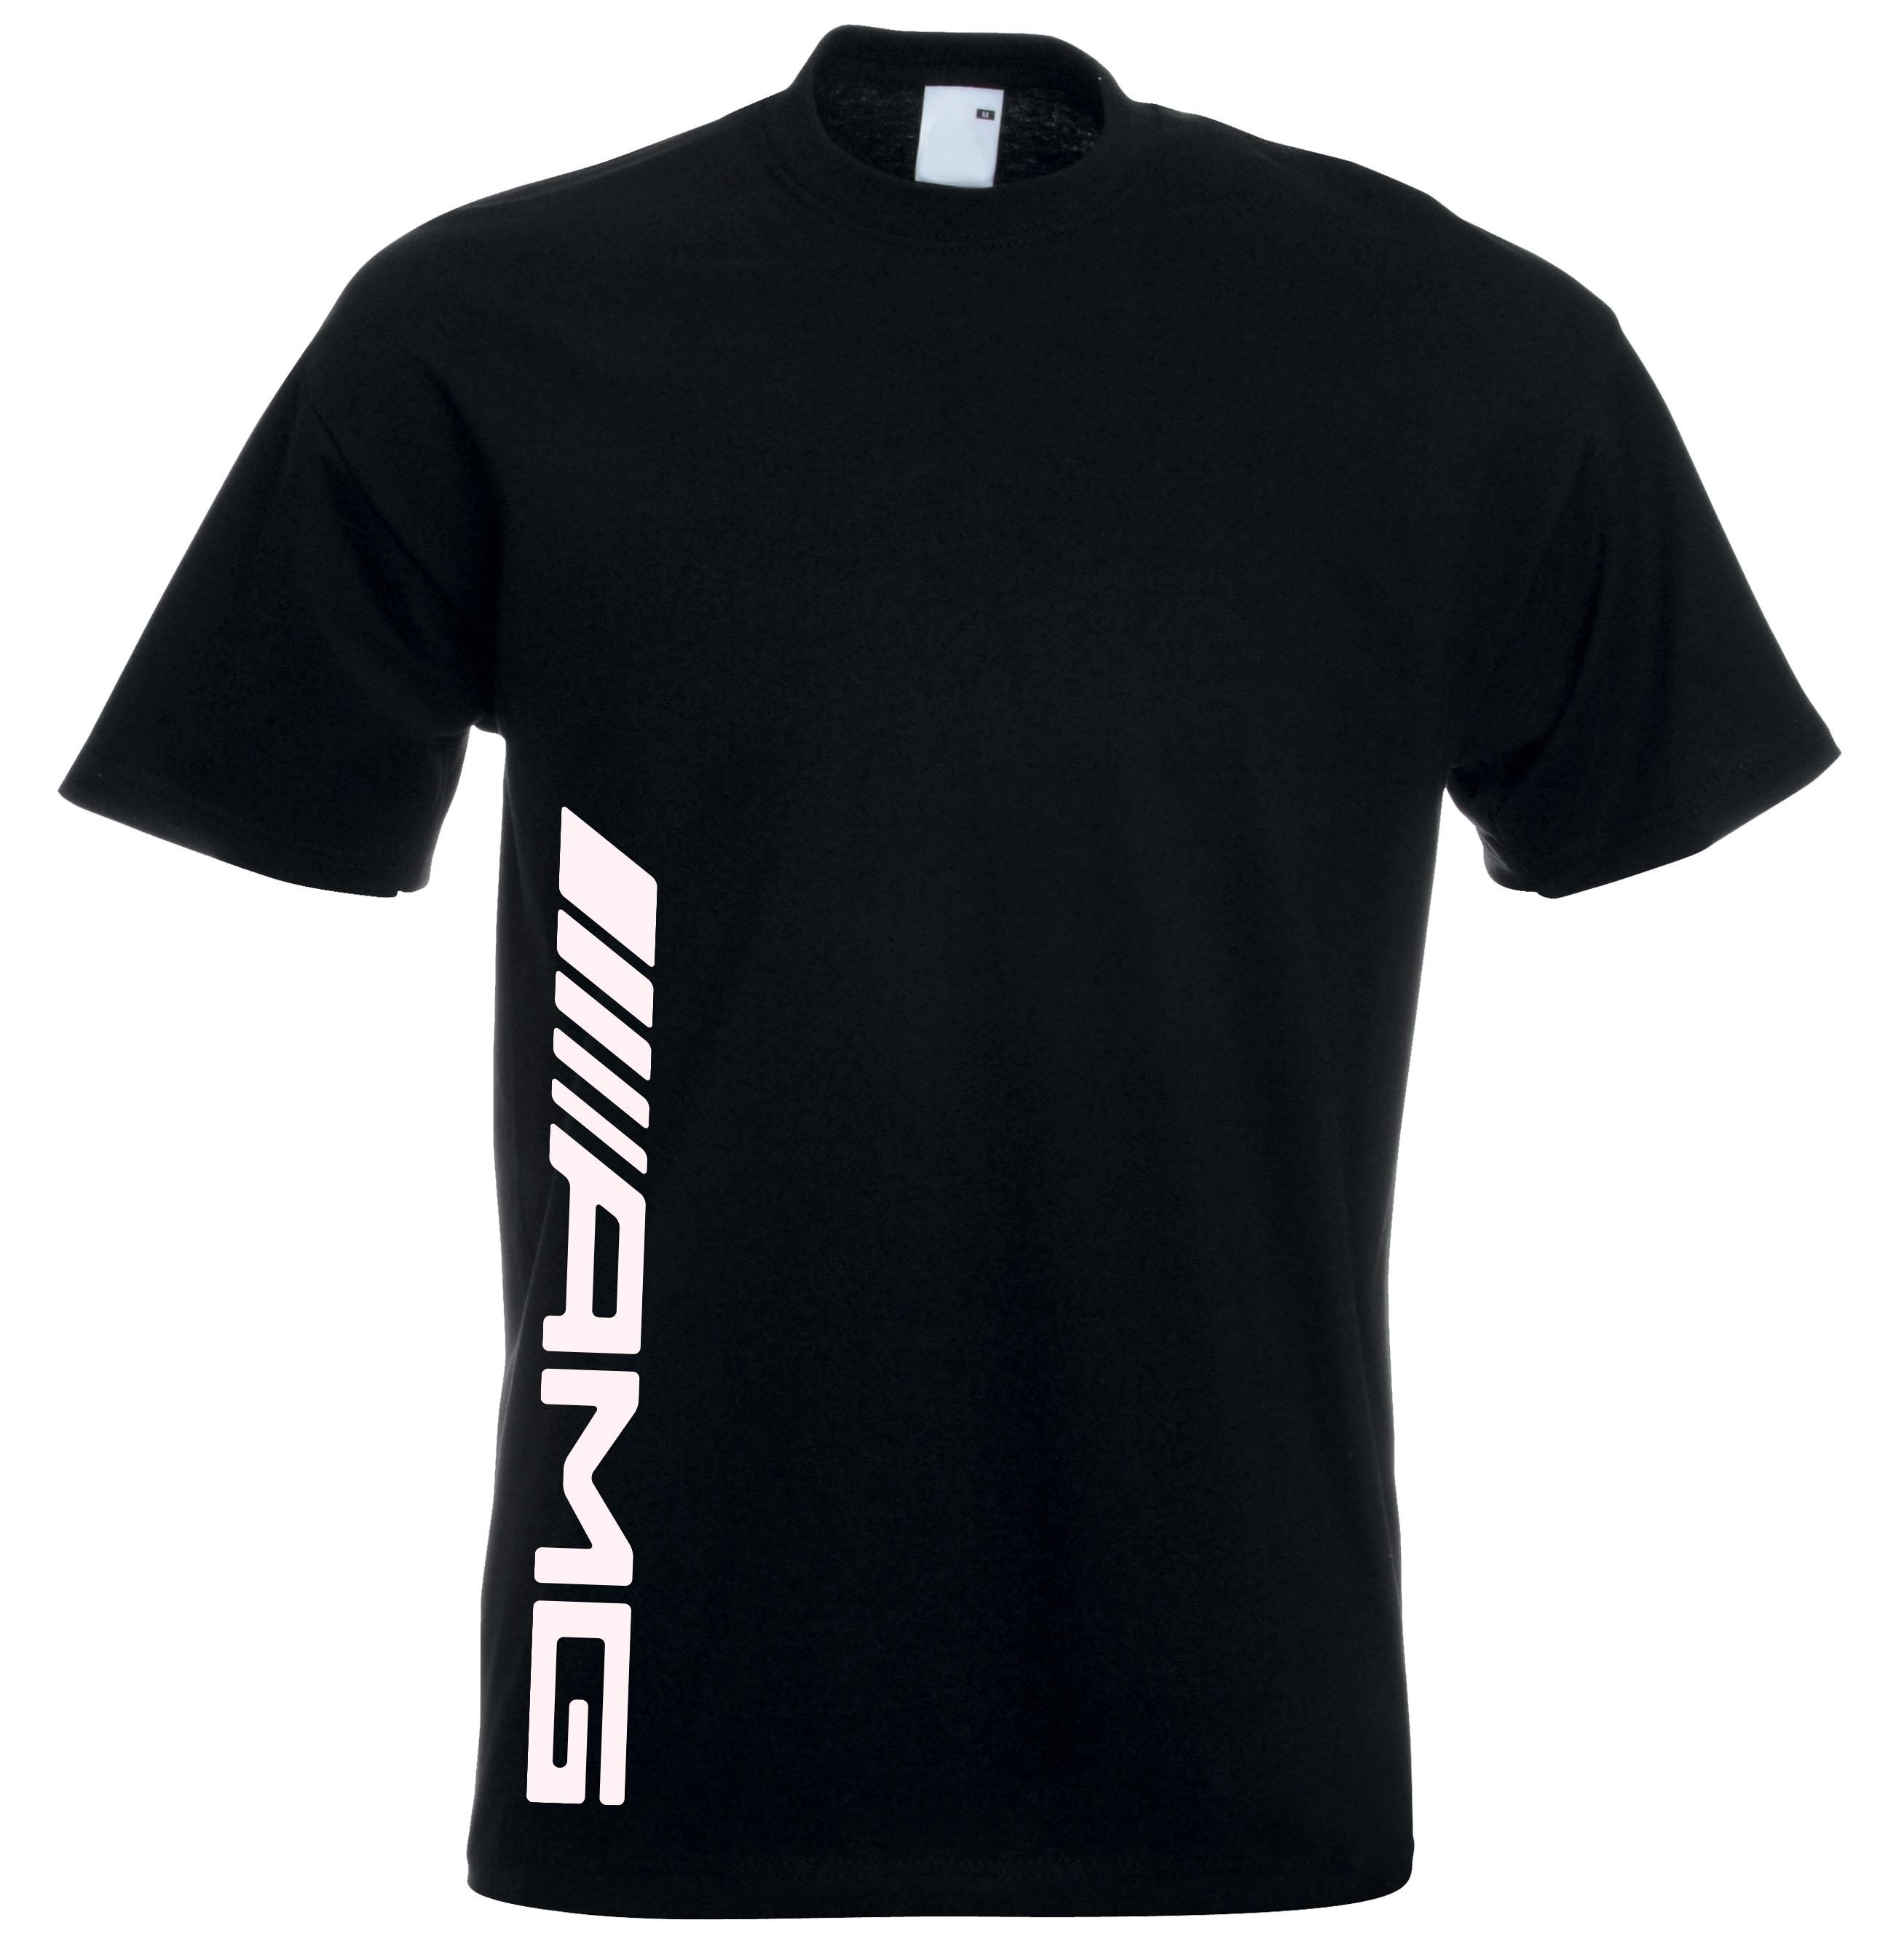 mercedes shirts tea shirt leshirt rex buy benz asp t off